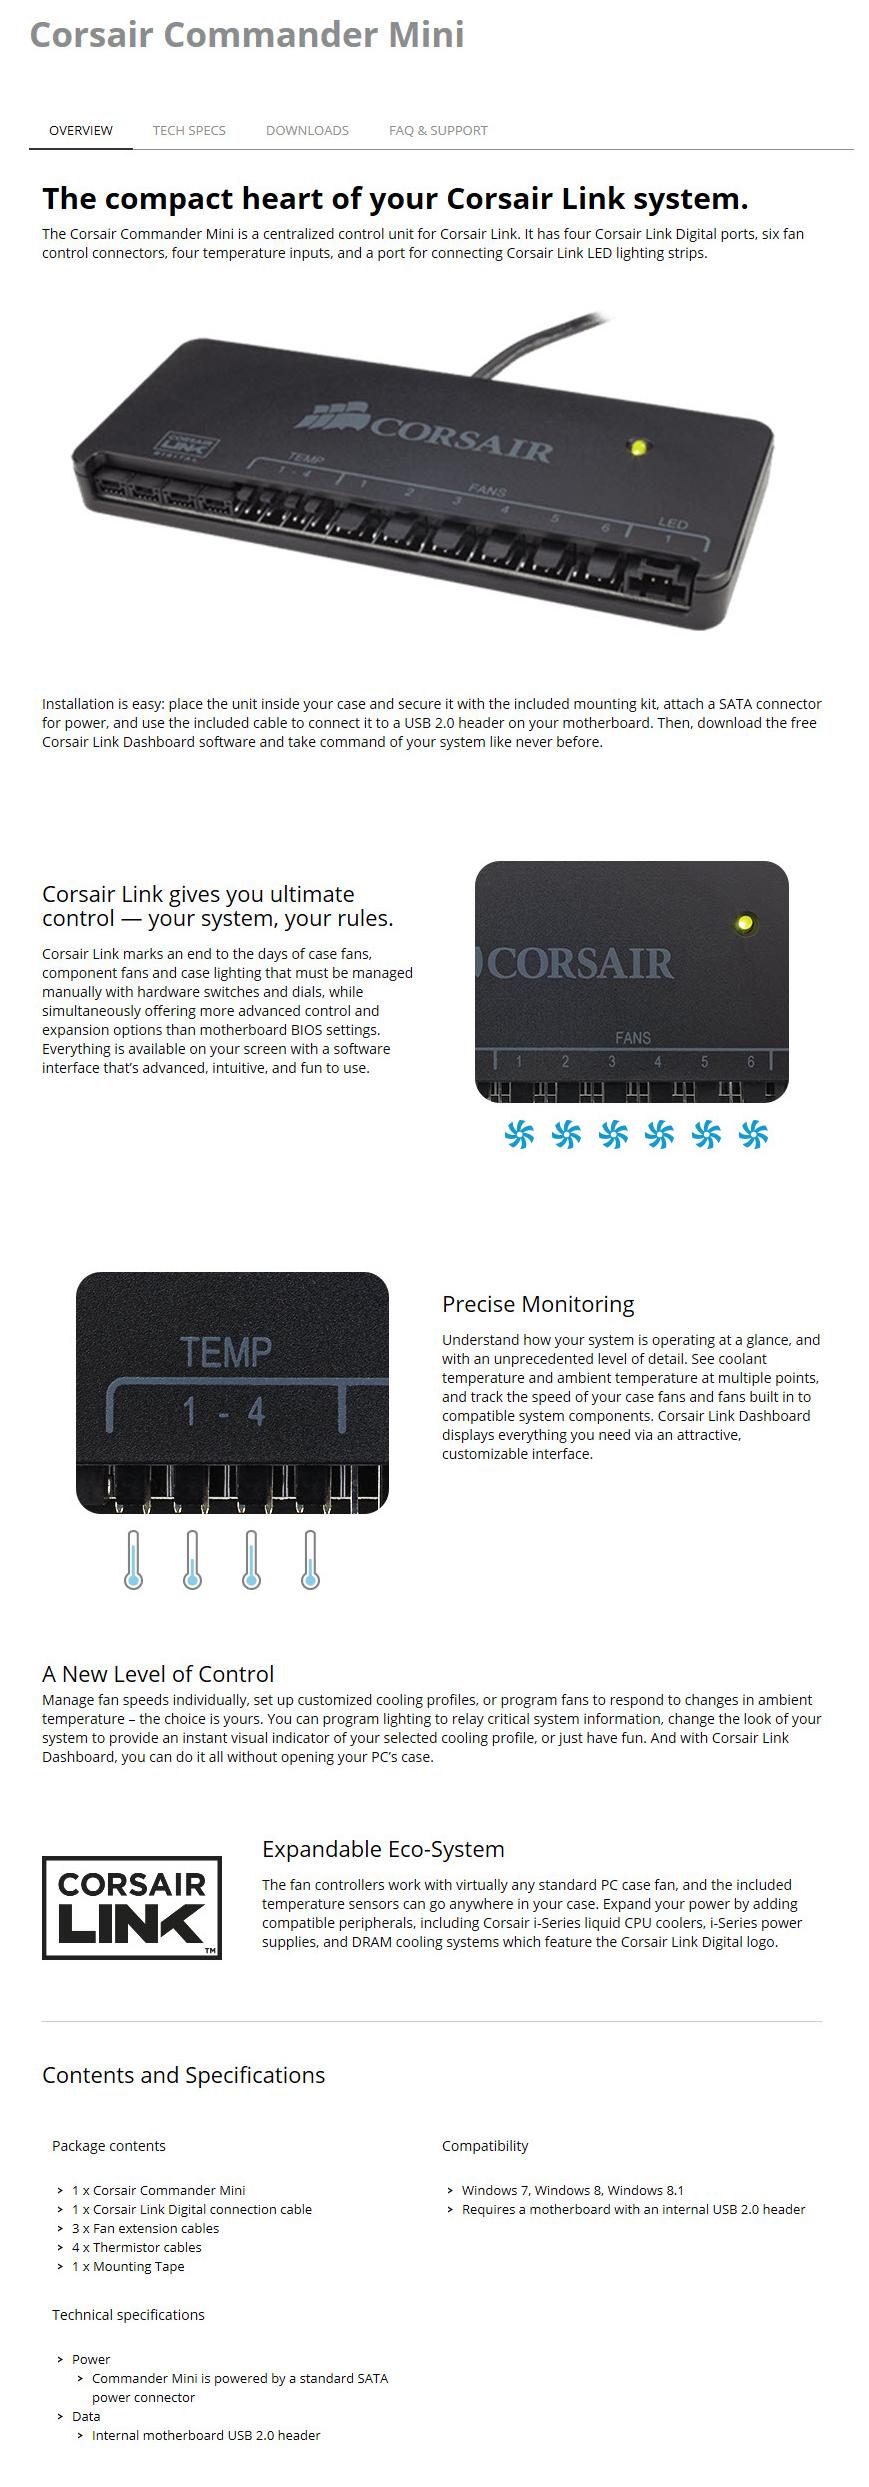 spec Corsair Commander Mini Review